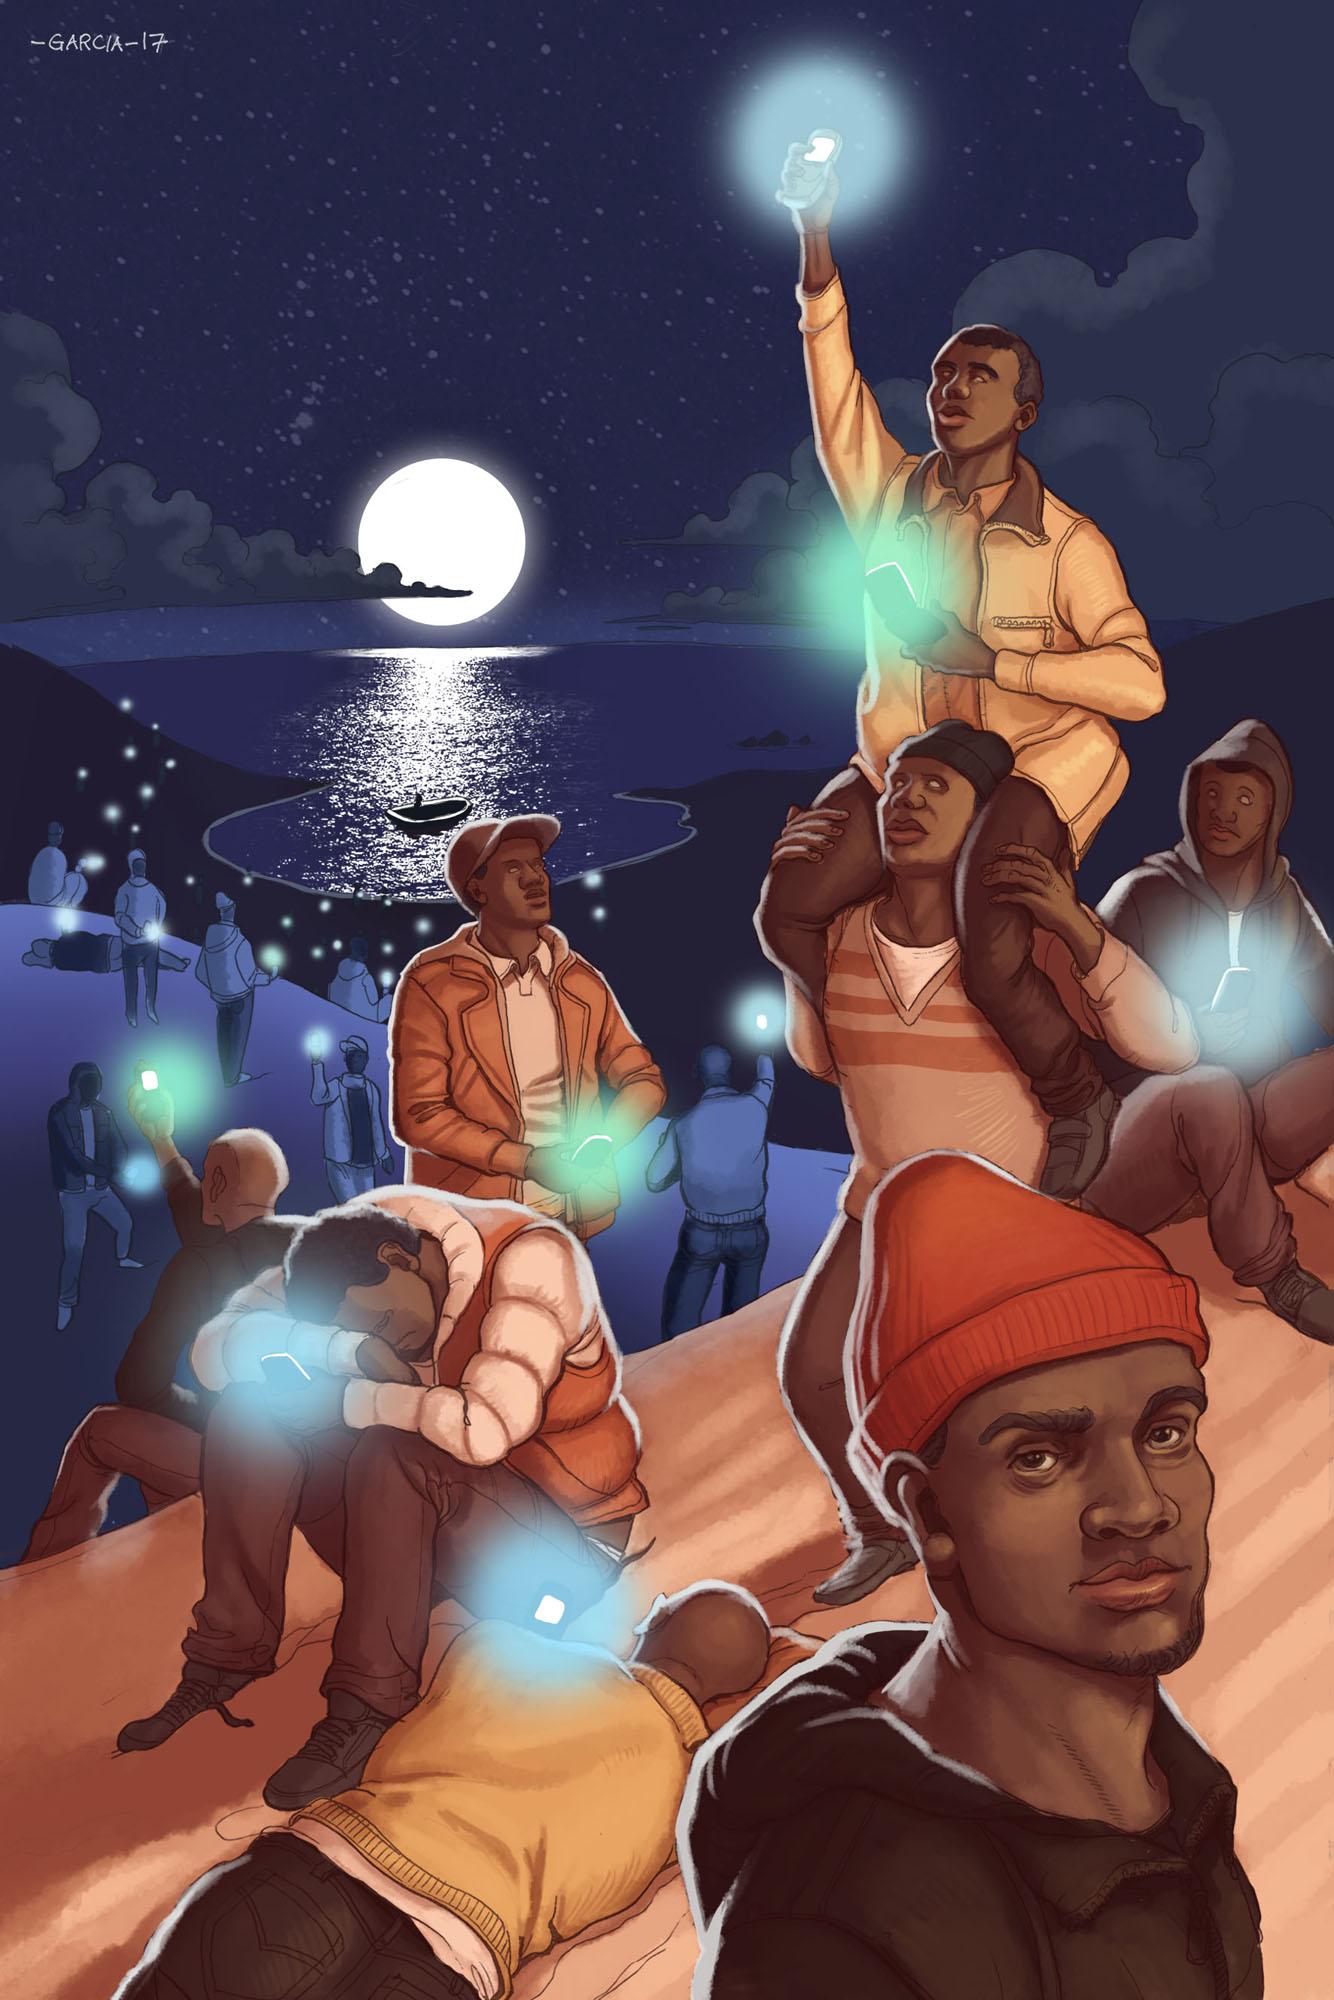 Daniel Garcia Art Illustration Editorial Popshot A Common Message Immigrants Refugees Desert Night Boats Mediterranean 01